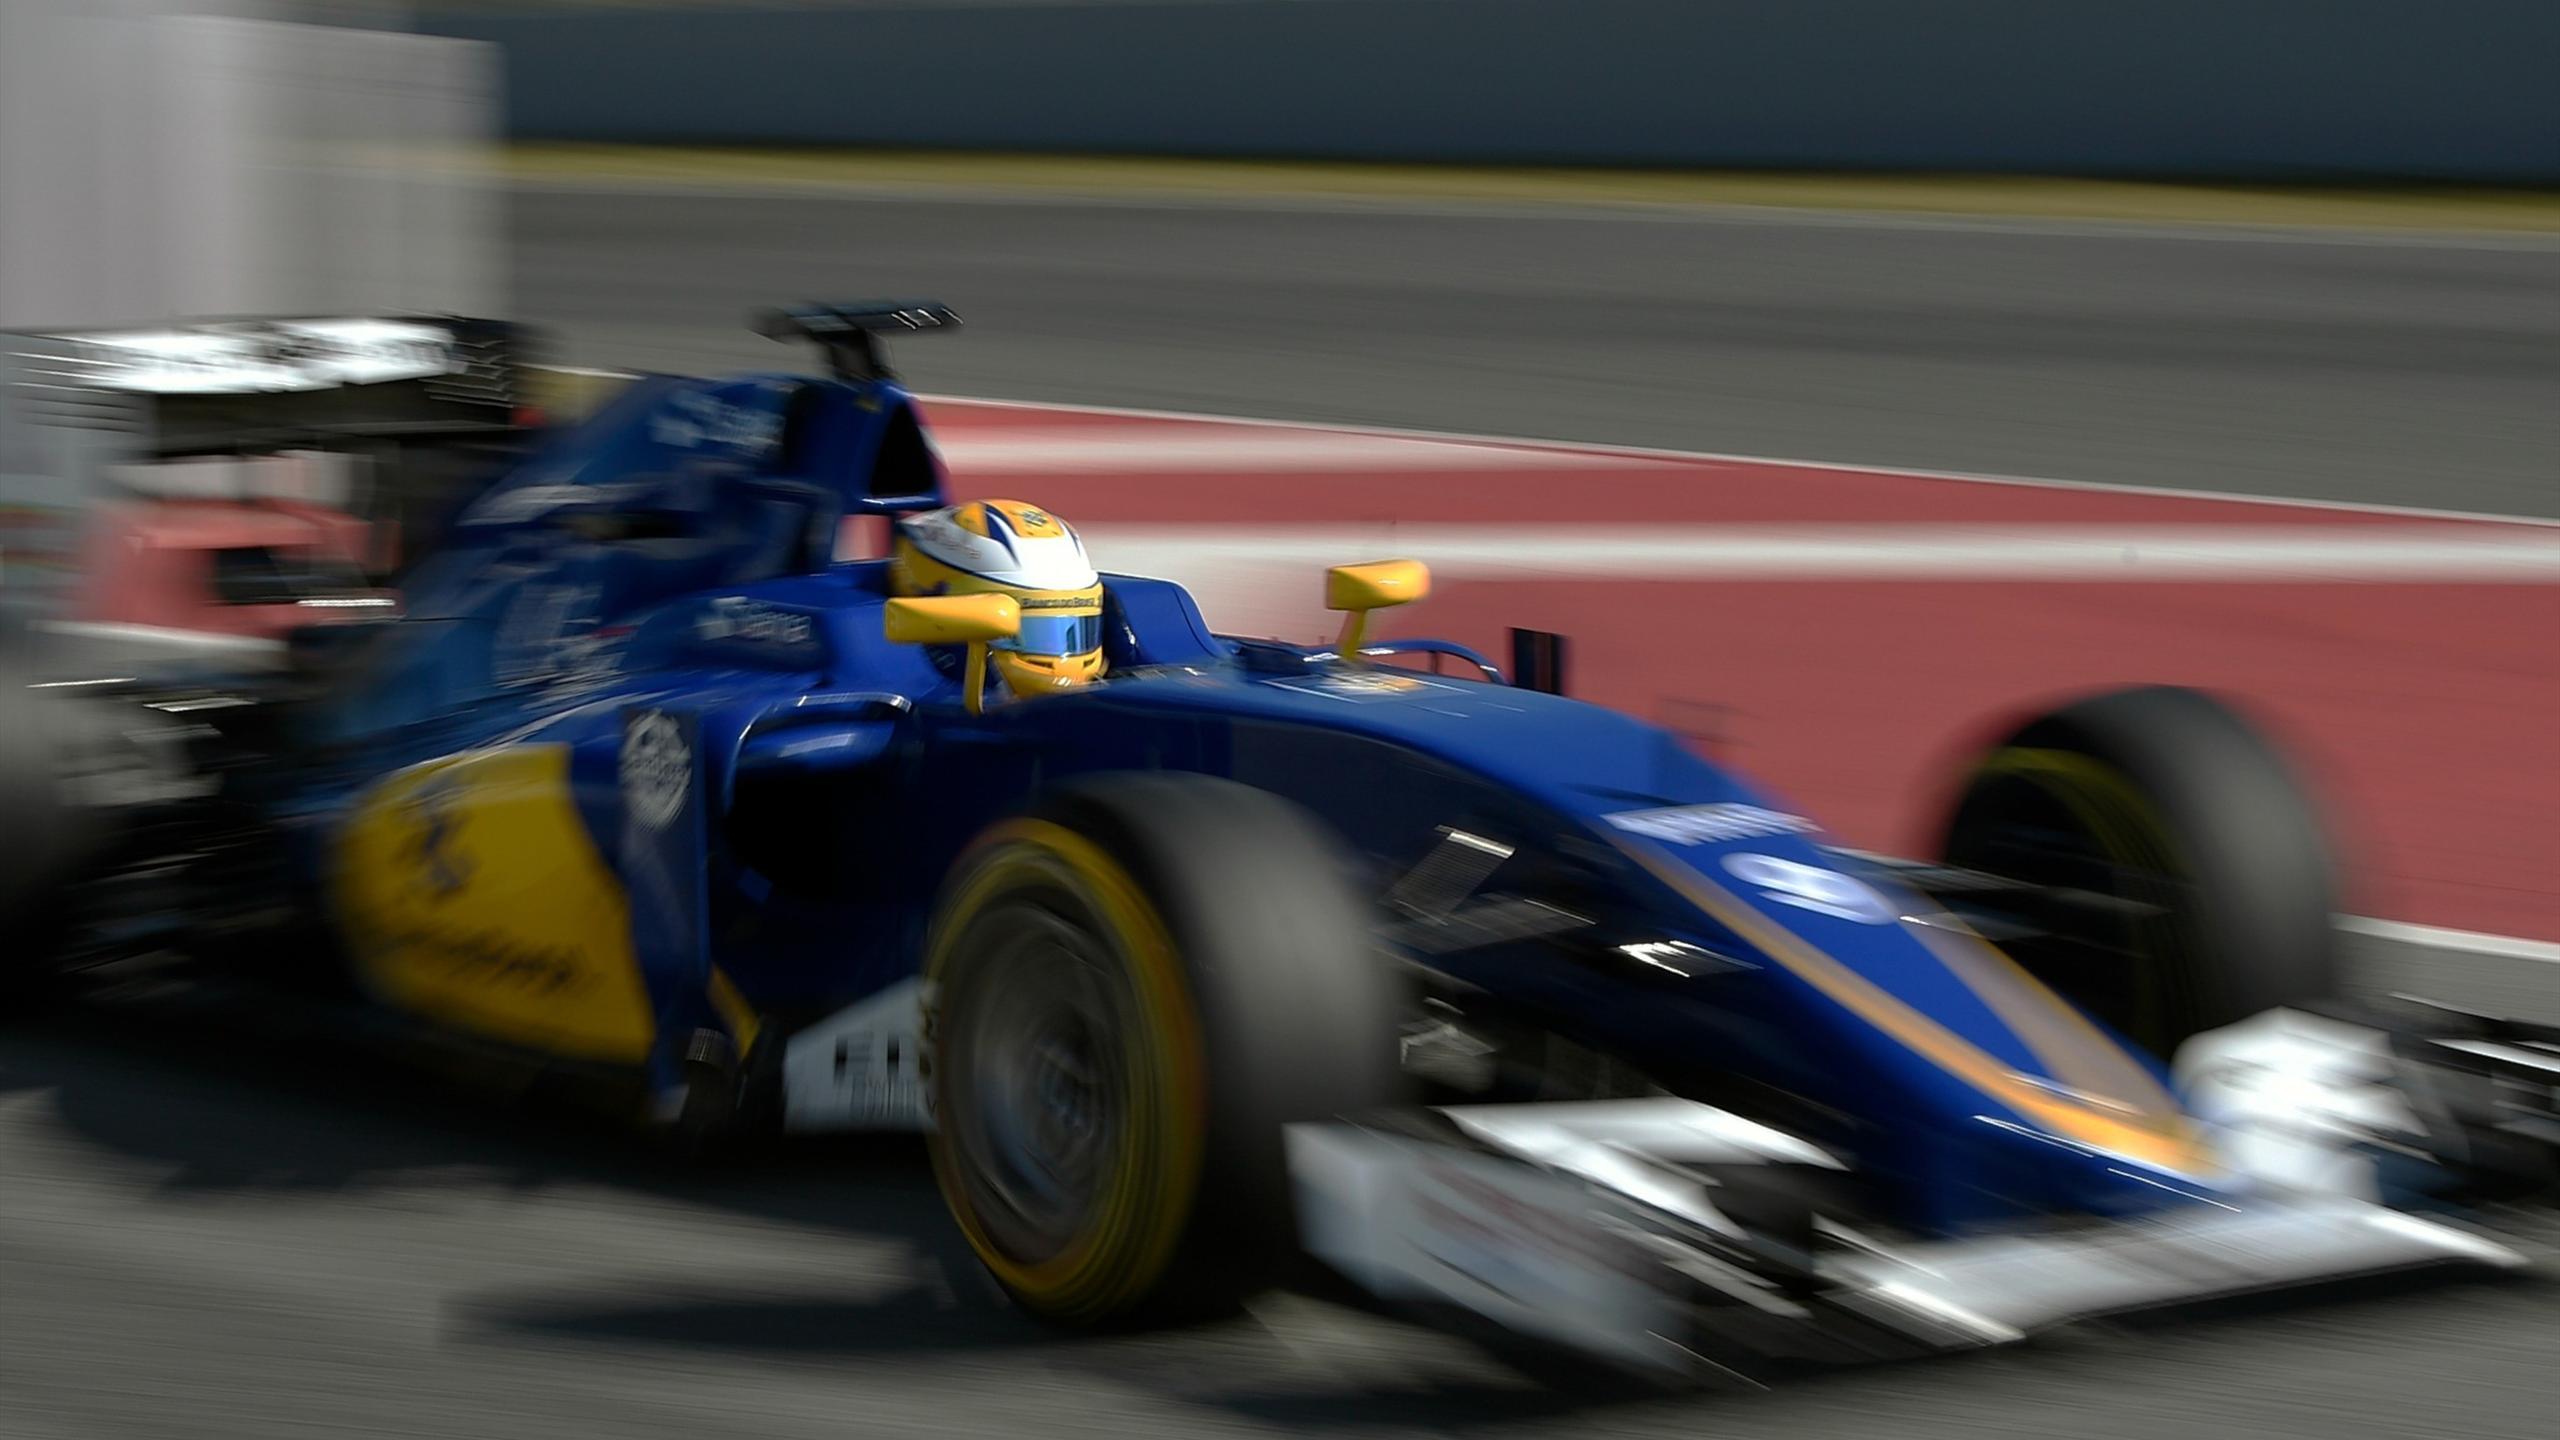 Marcus Ericsson (Sauber) - Tests Montmelo 2016